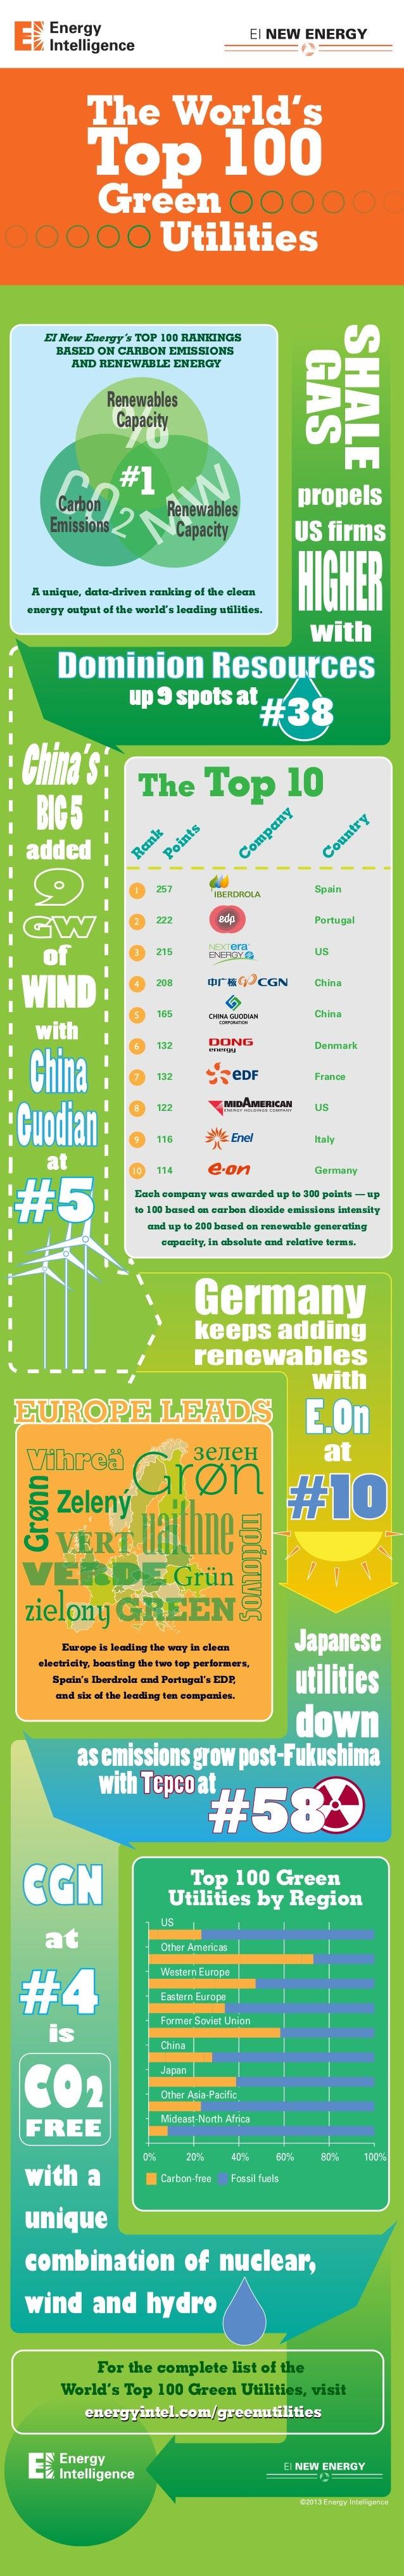 CO2 M W % #1Carbon Emissions Renewables Capacity Renewables Capacity The World's Top 100 Green Utilities 257 Spain 222 Por...